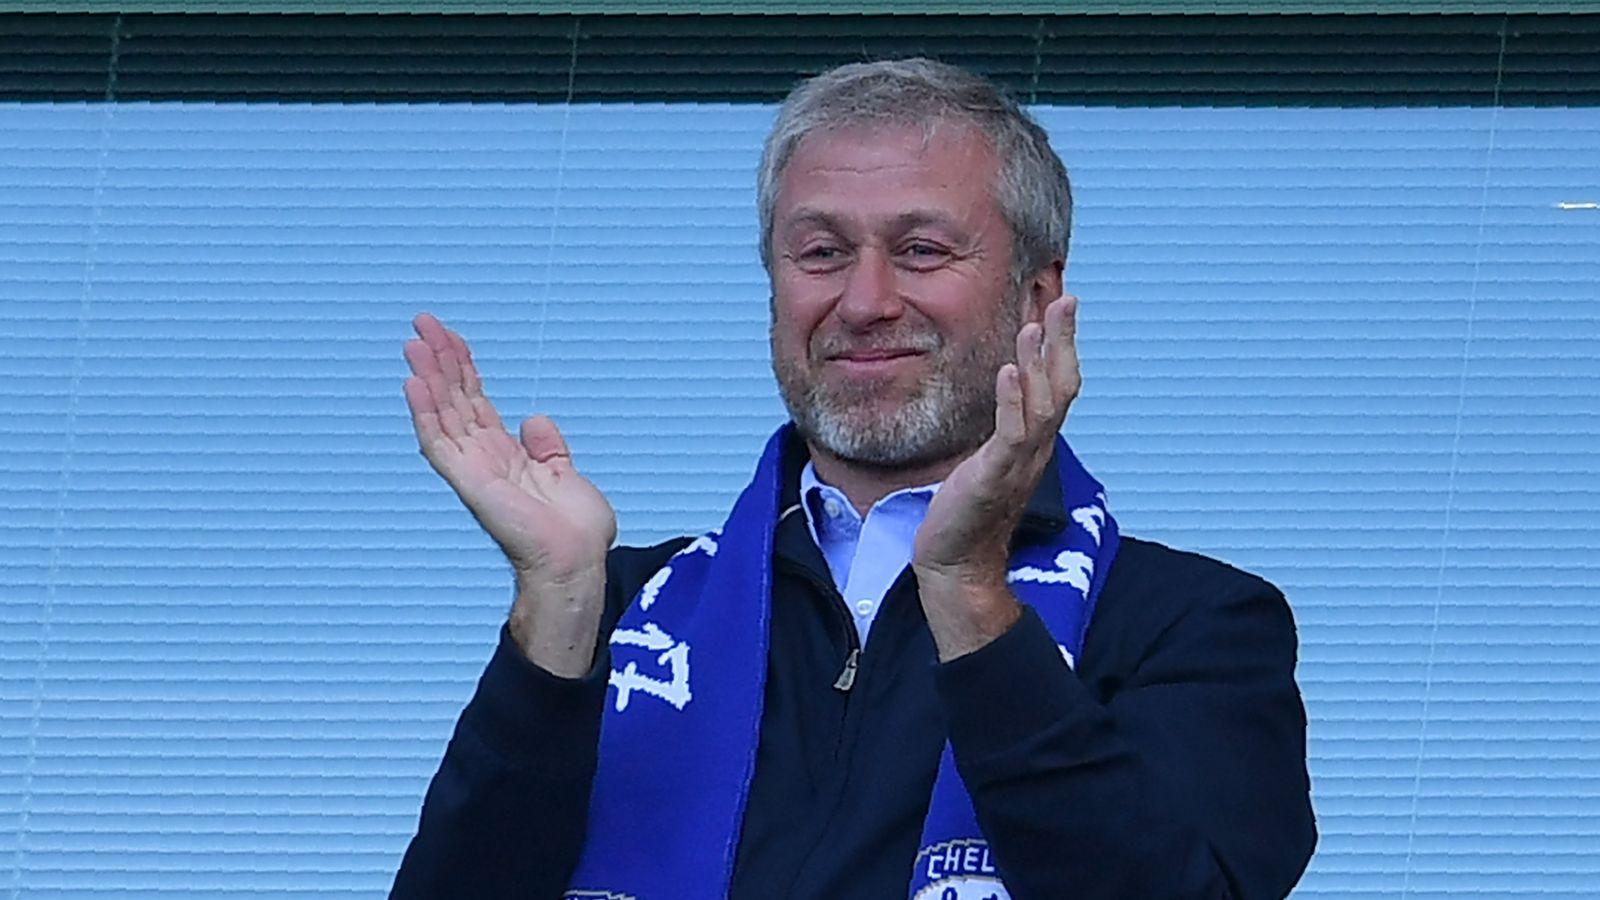 Chelsea owner Roman Abramovich's UK visa expires amid ...